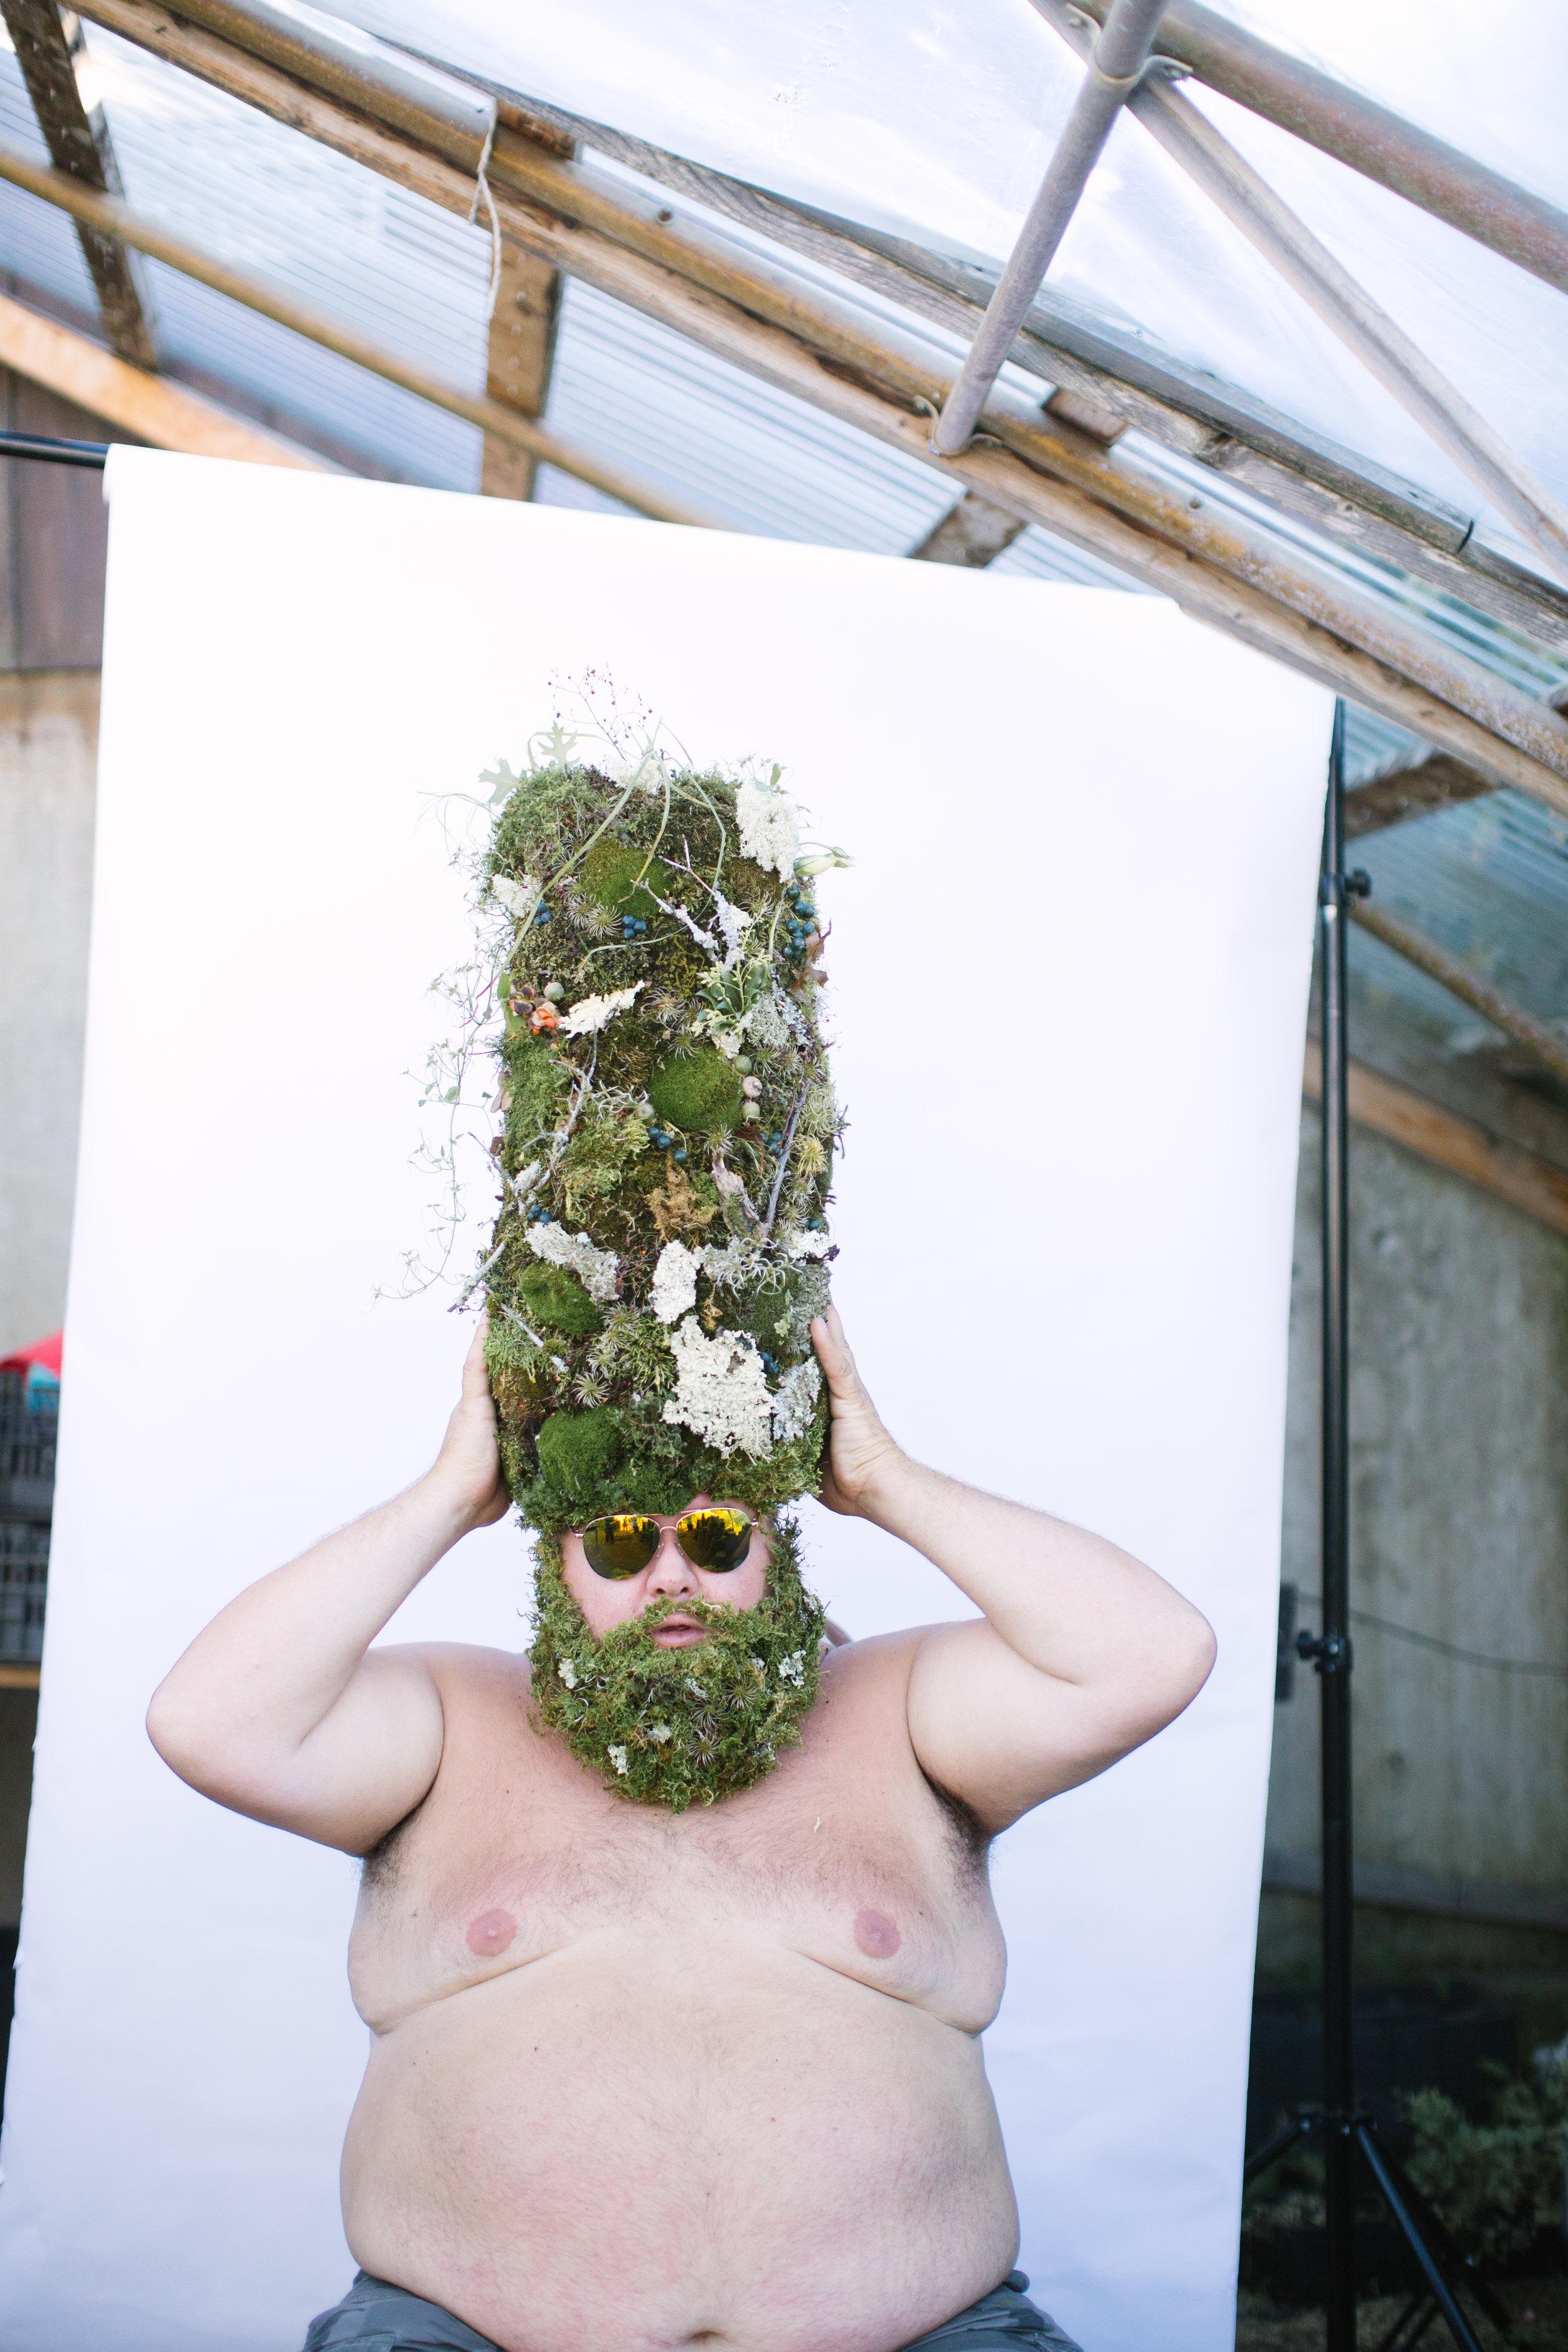 Floras-muse-beehivecollective-florist-head-piece-peonies-maineweddings-sunglasses.jpg